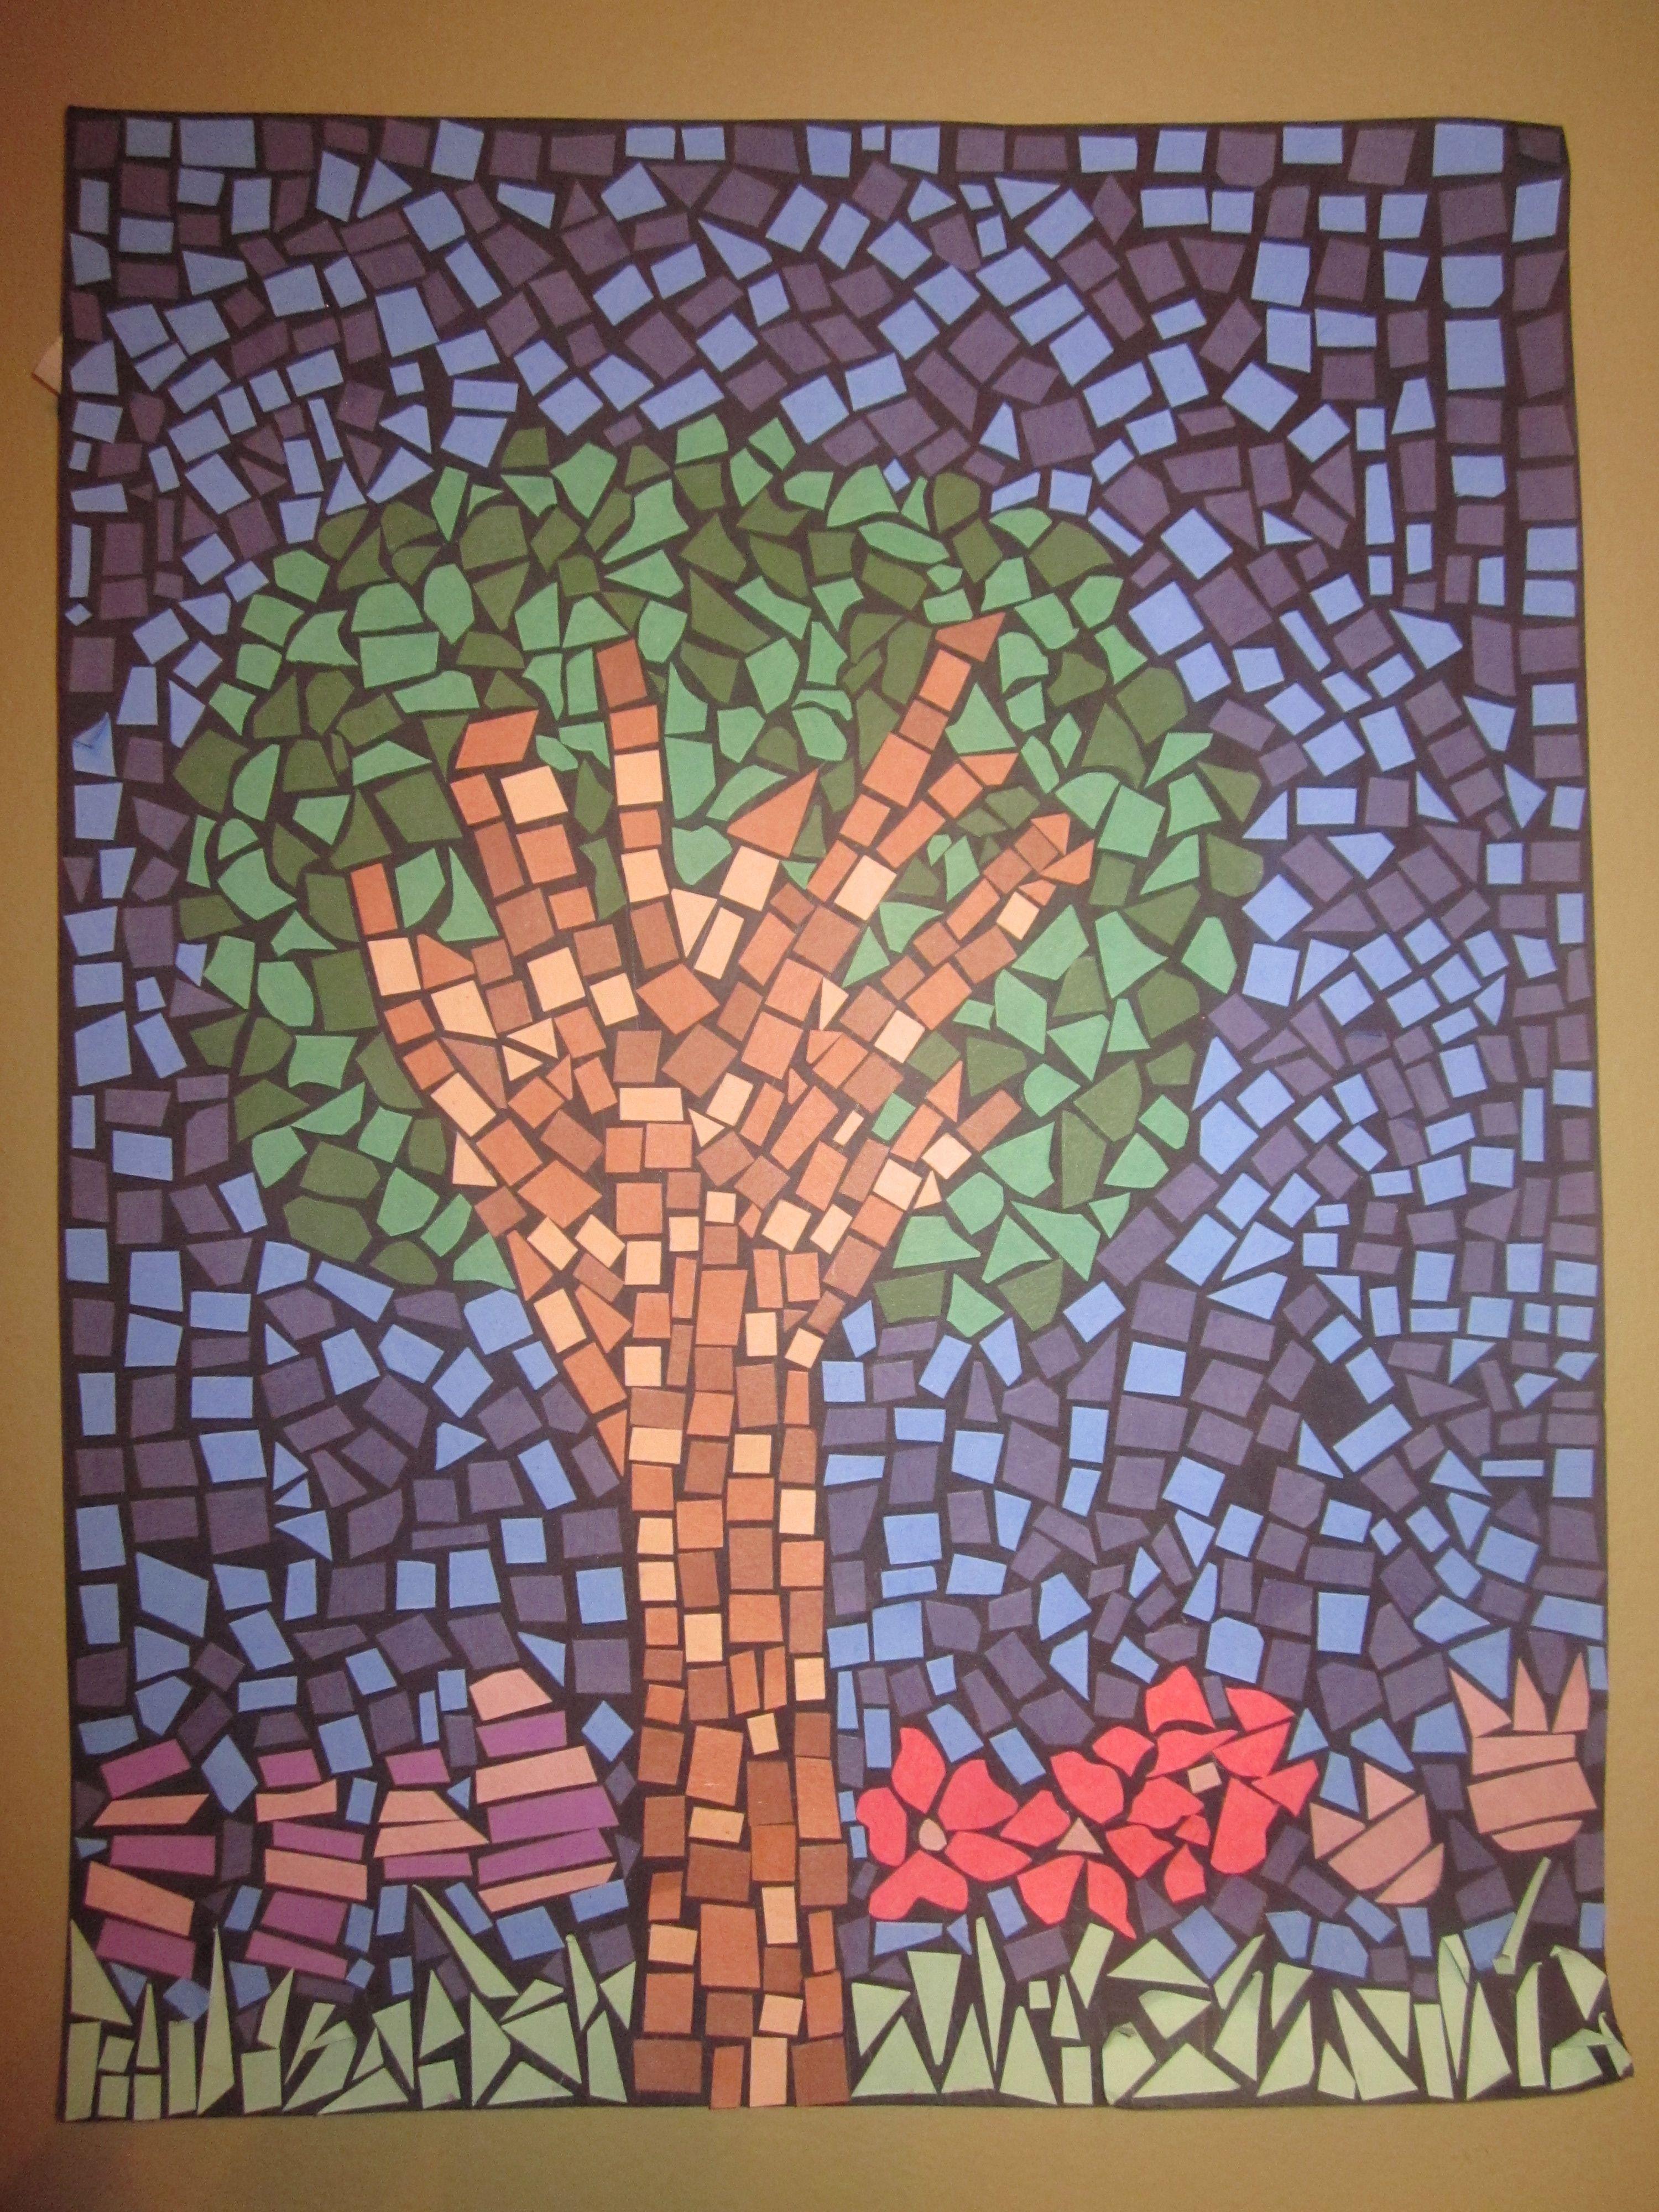 Arts And Crafts Mosaic Tiles | Tile Design Ideas